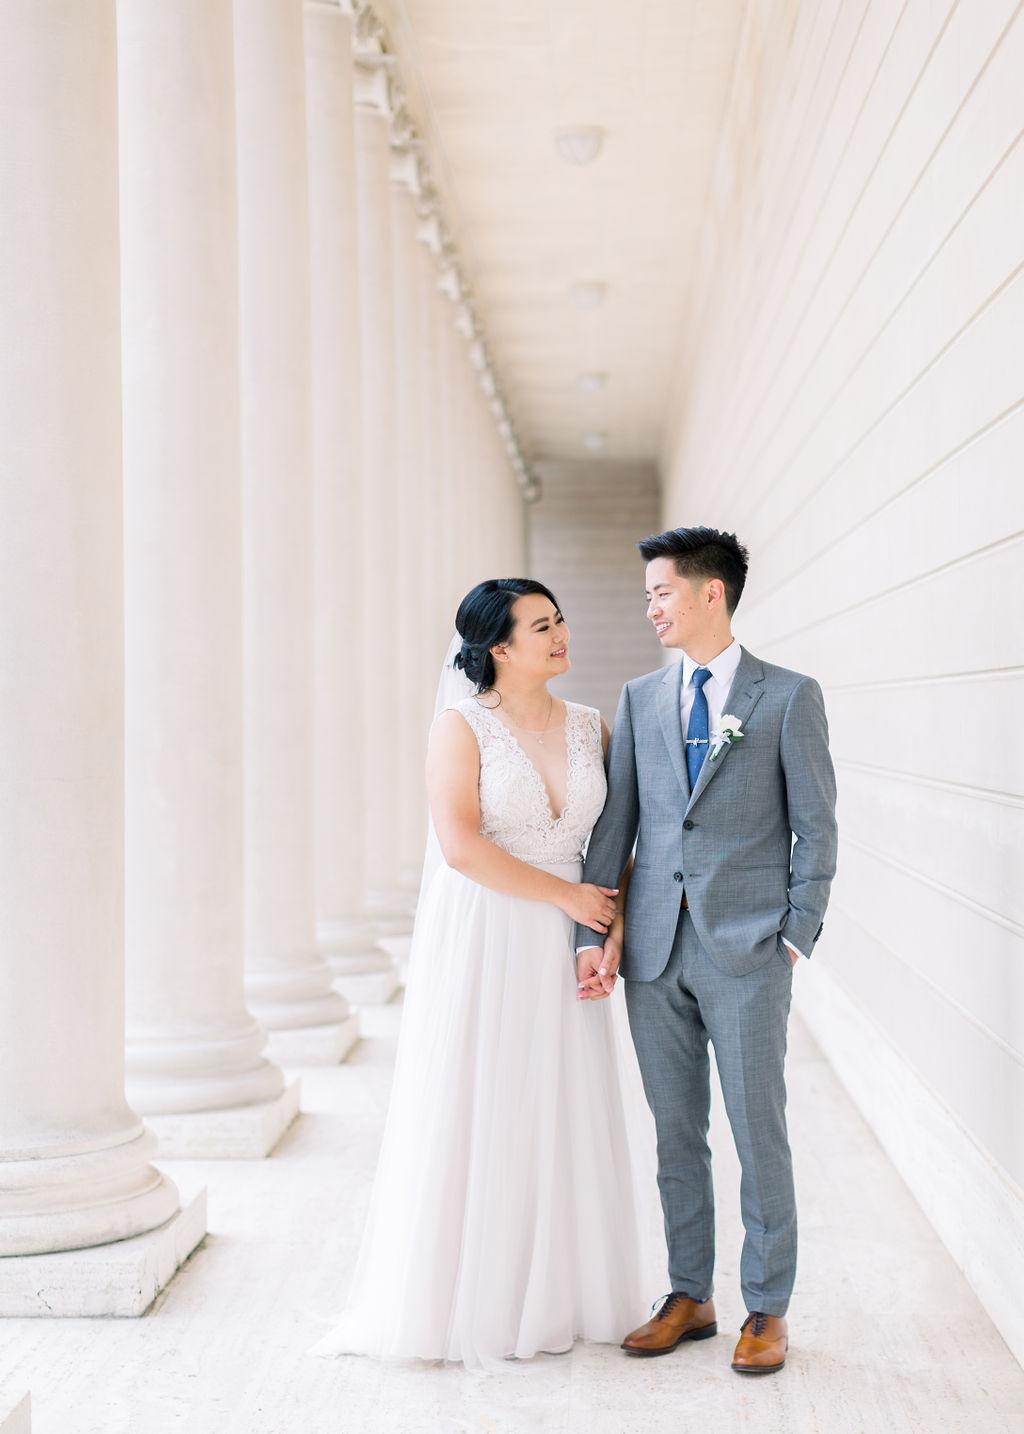 trynhphoto-bay-area-sf-san-francisco-wedding-photographer-bride-groom-LR-22-2.jpg